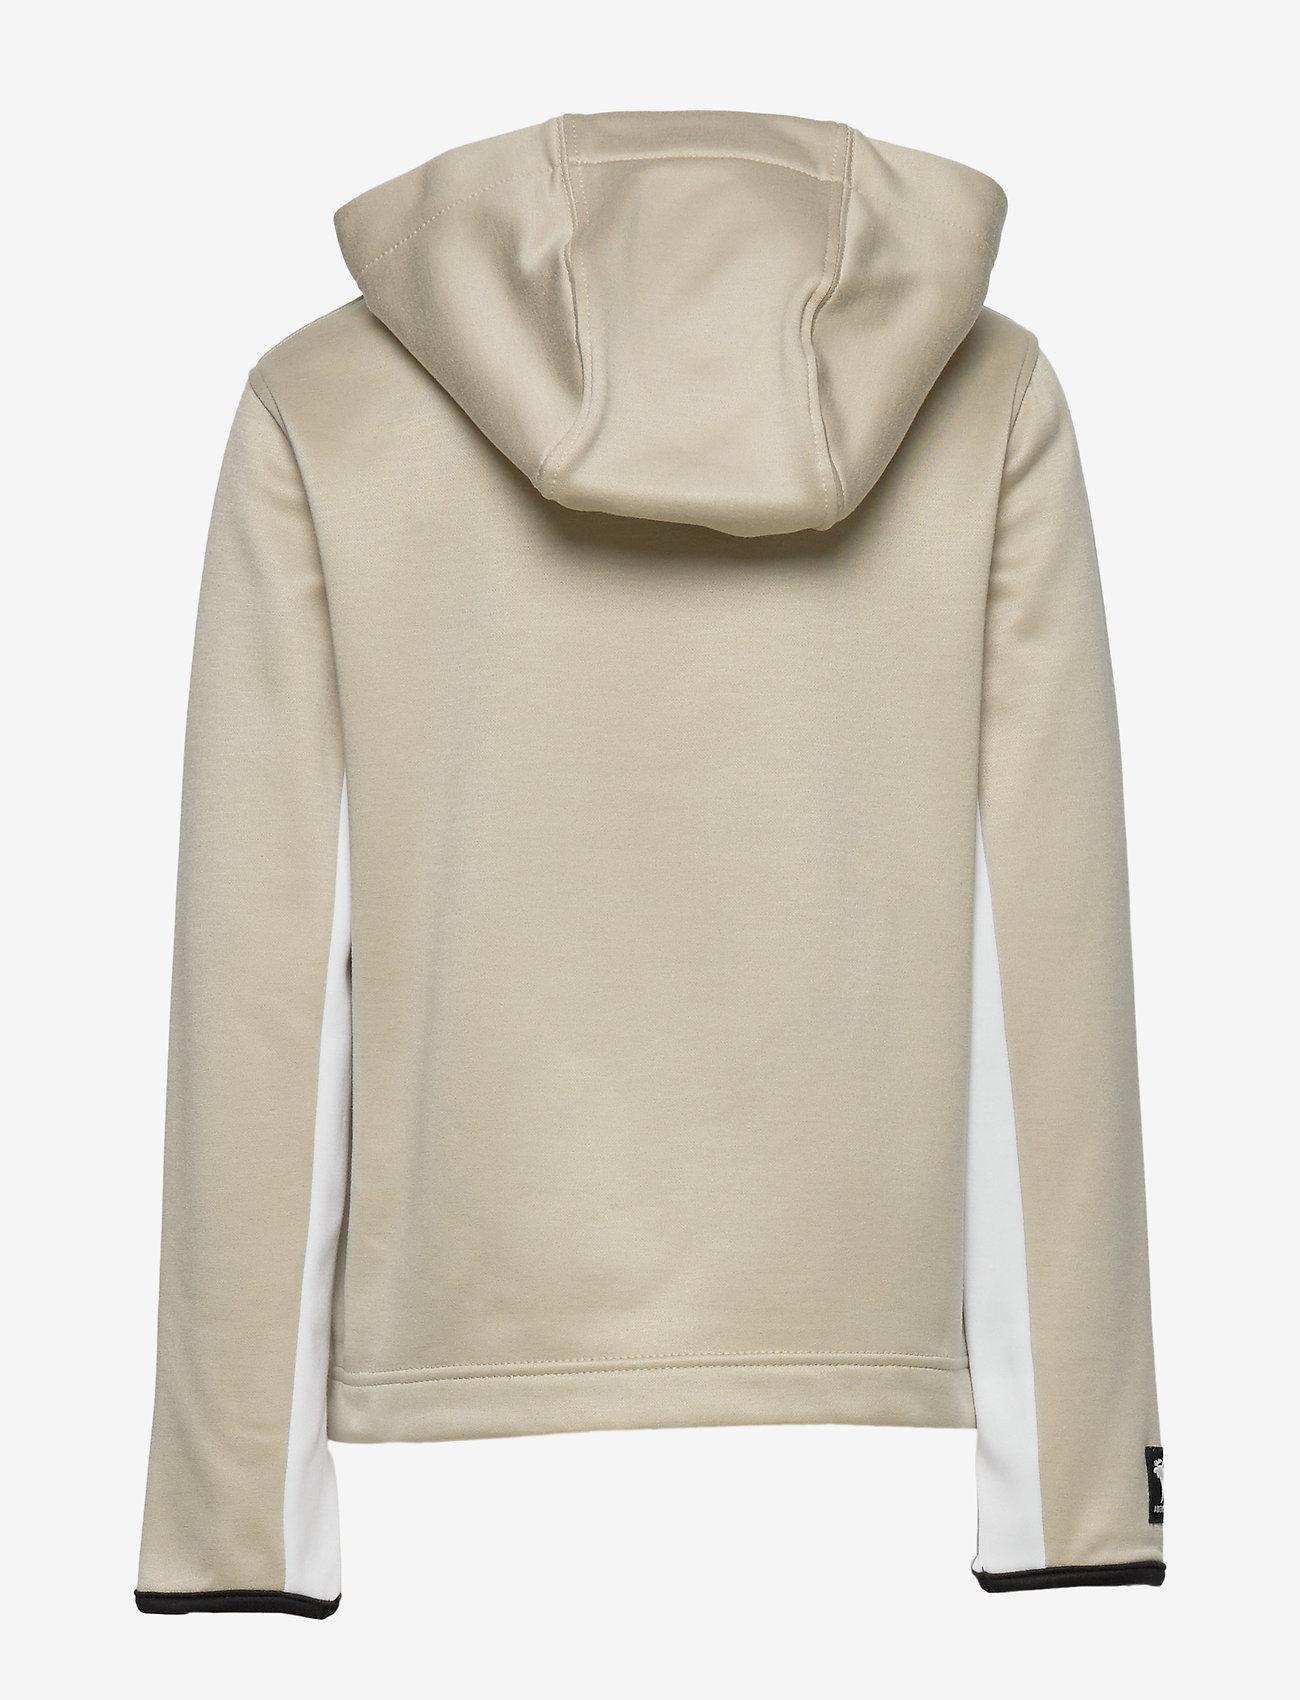 Abercrombie & Fitch Logo Sweatshirt - Överdelar Open Grey 16